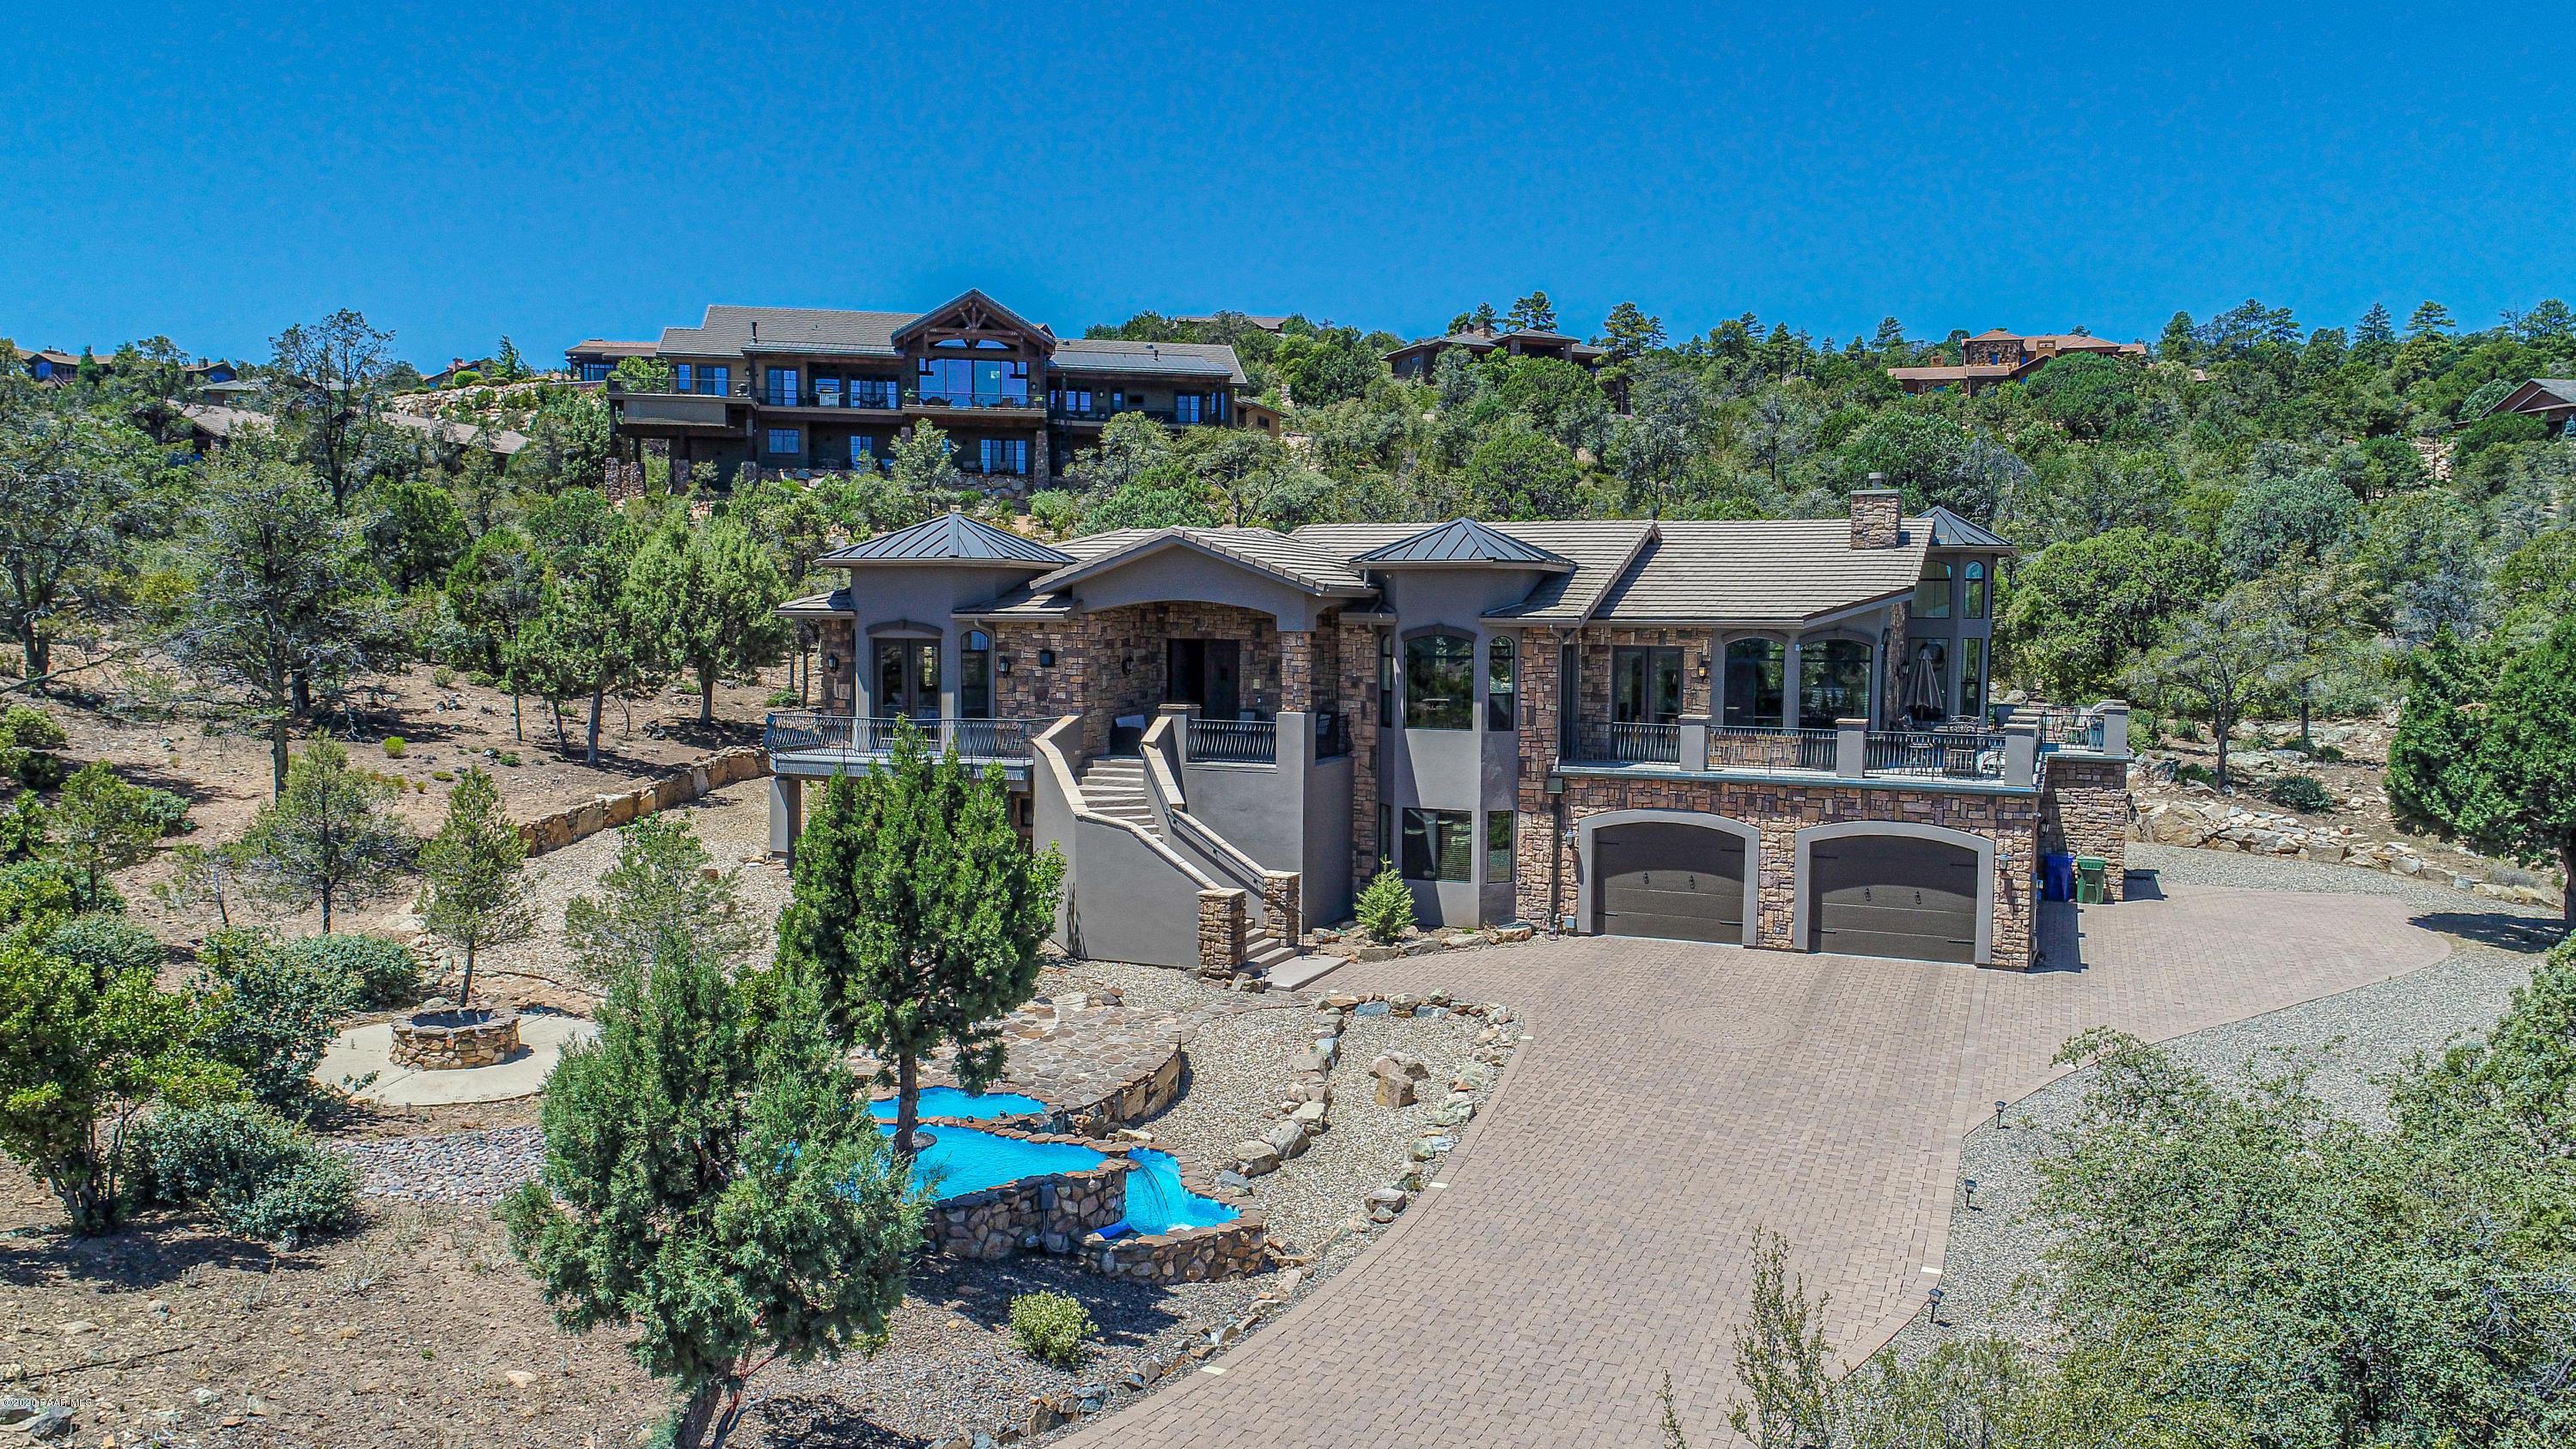 Photo of 920 Winding Spruce, Prescott, AZ 86303